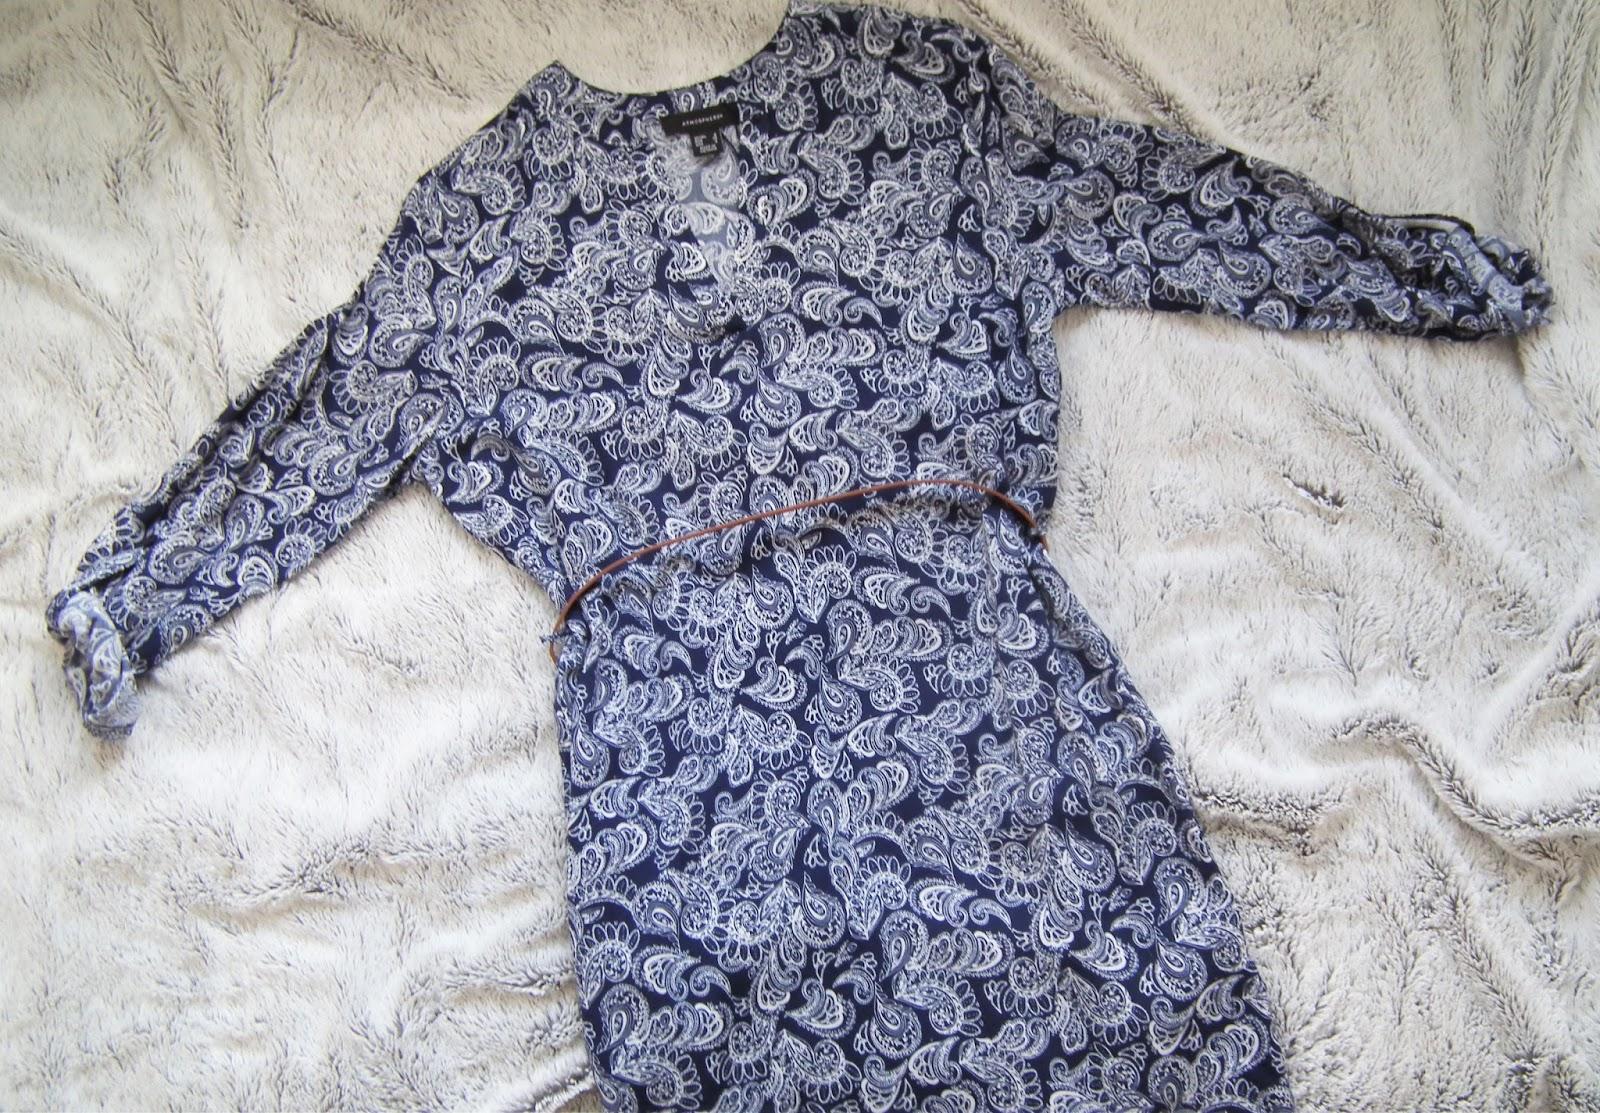 Primark Haul - Spring 2016 Print Dress with Tanned Belt